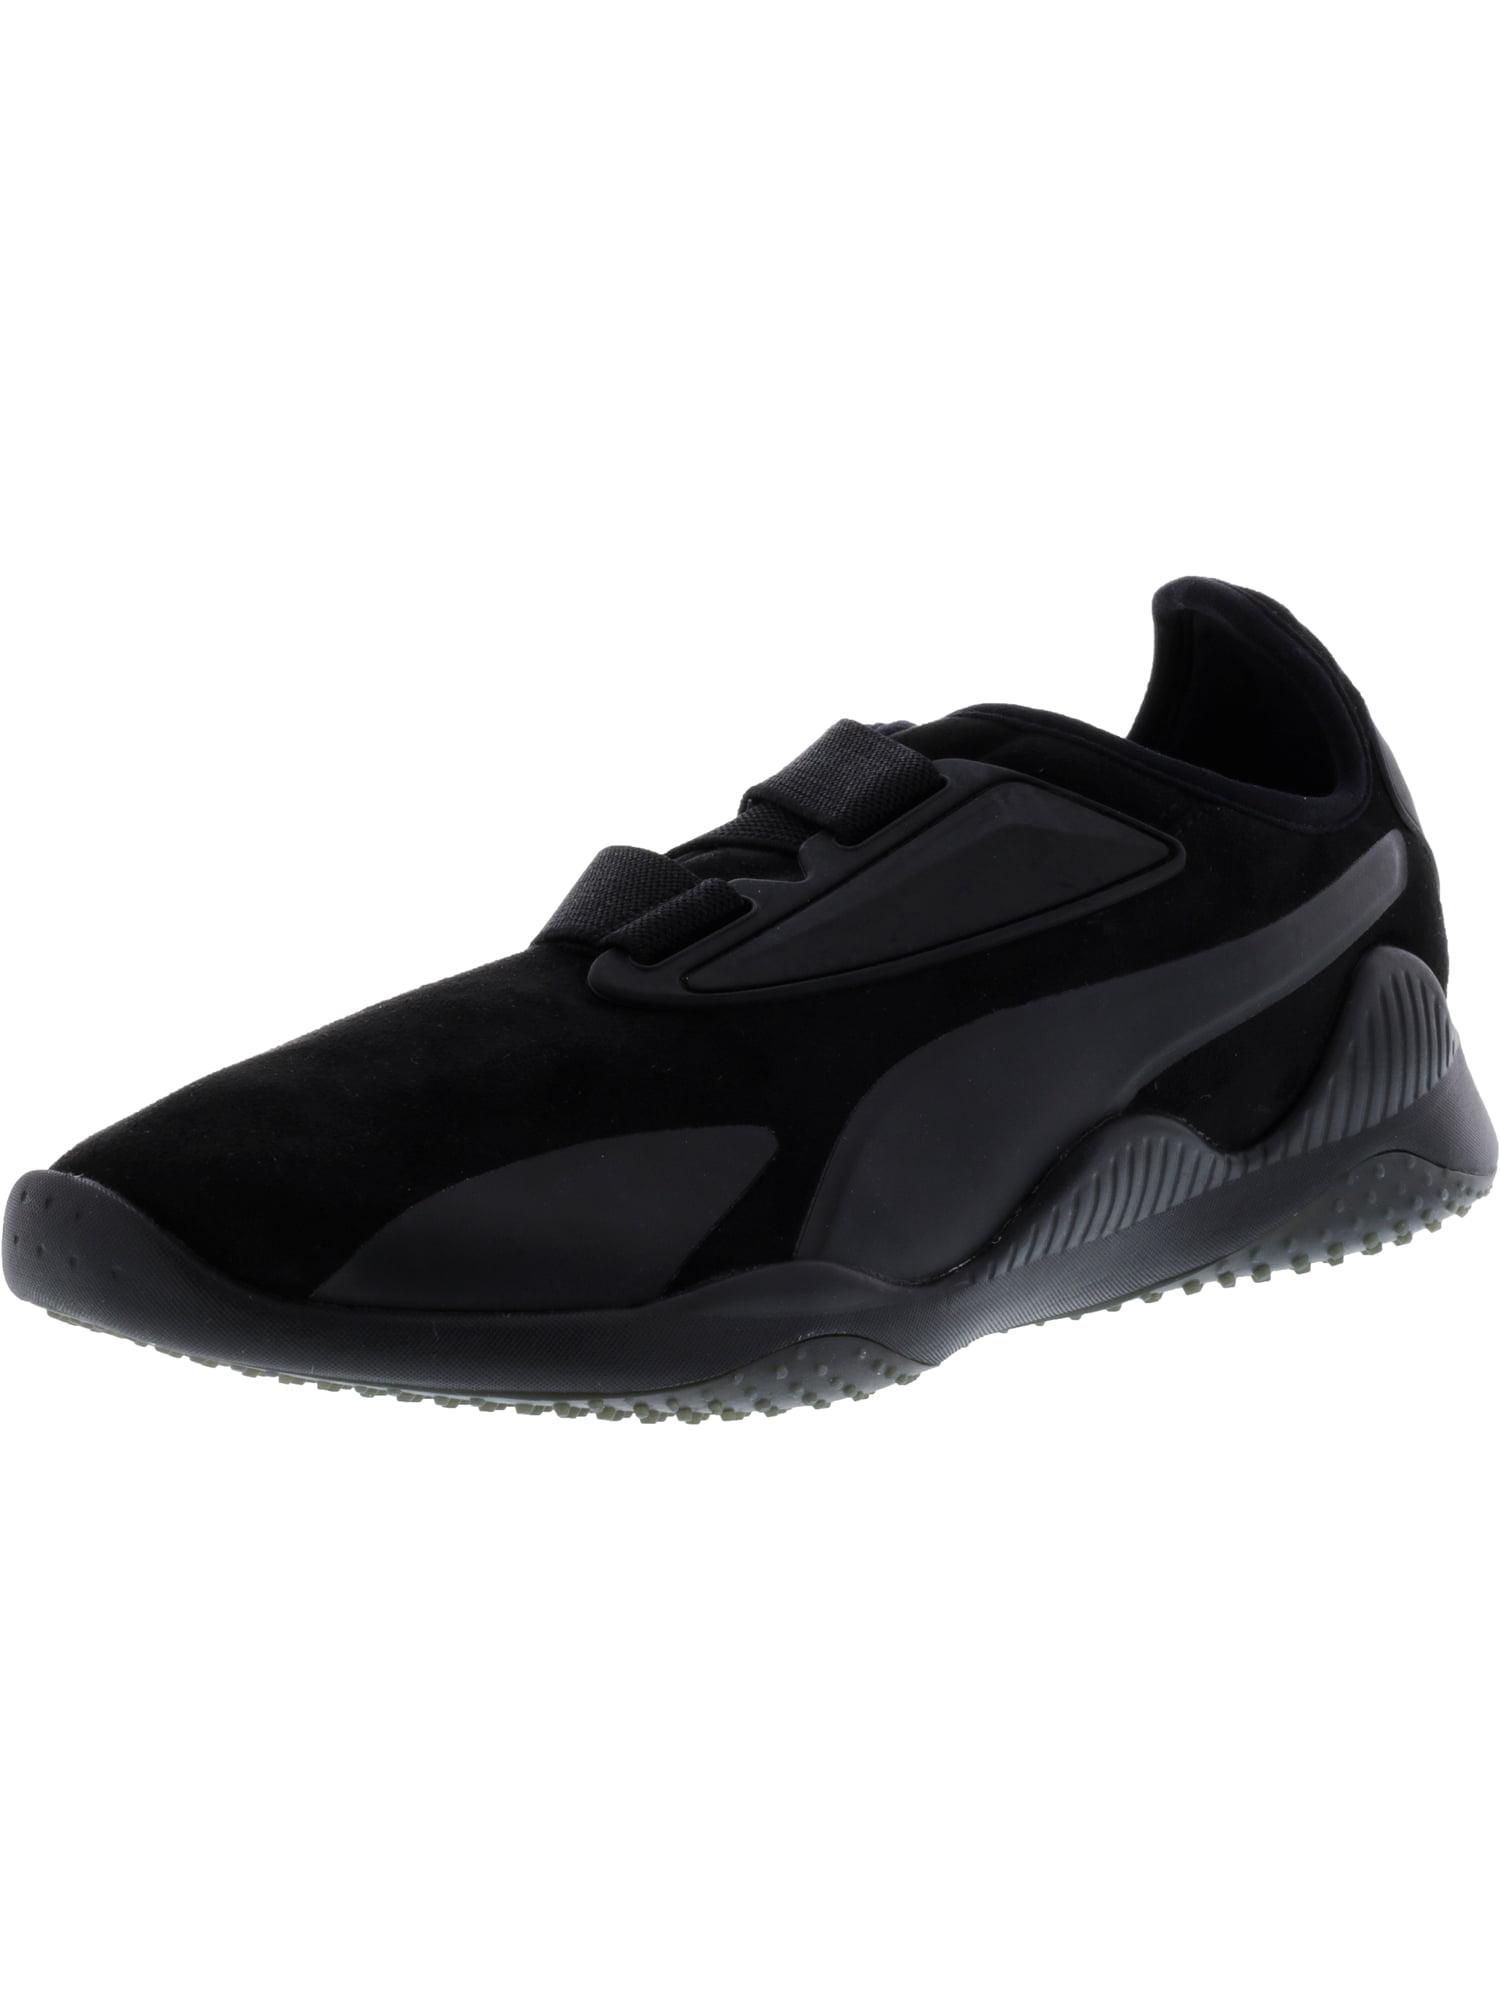 Puma Men's Mostro Hypernature Olive Night Ankle-High Fashion Sneaker - 12M